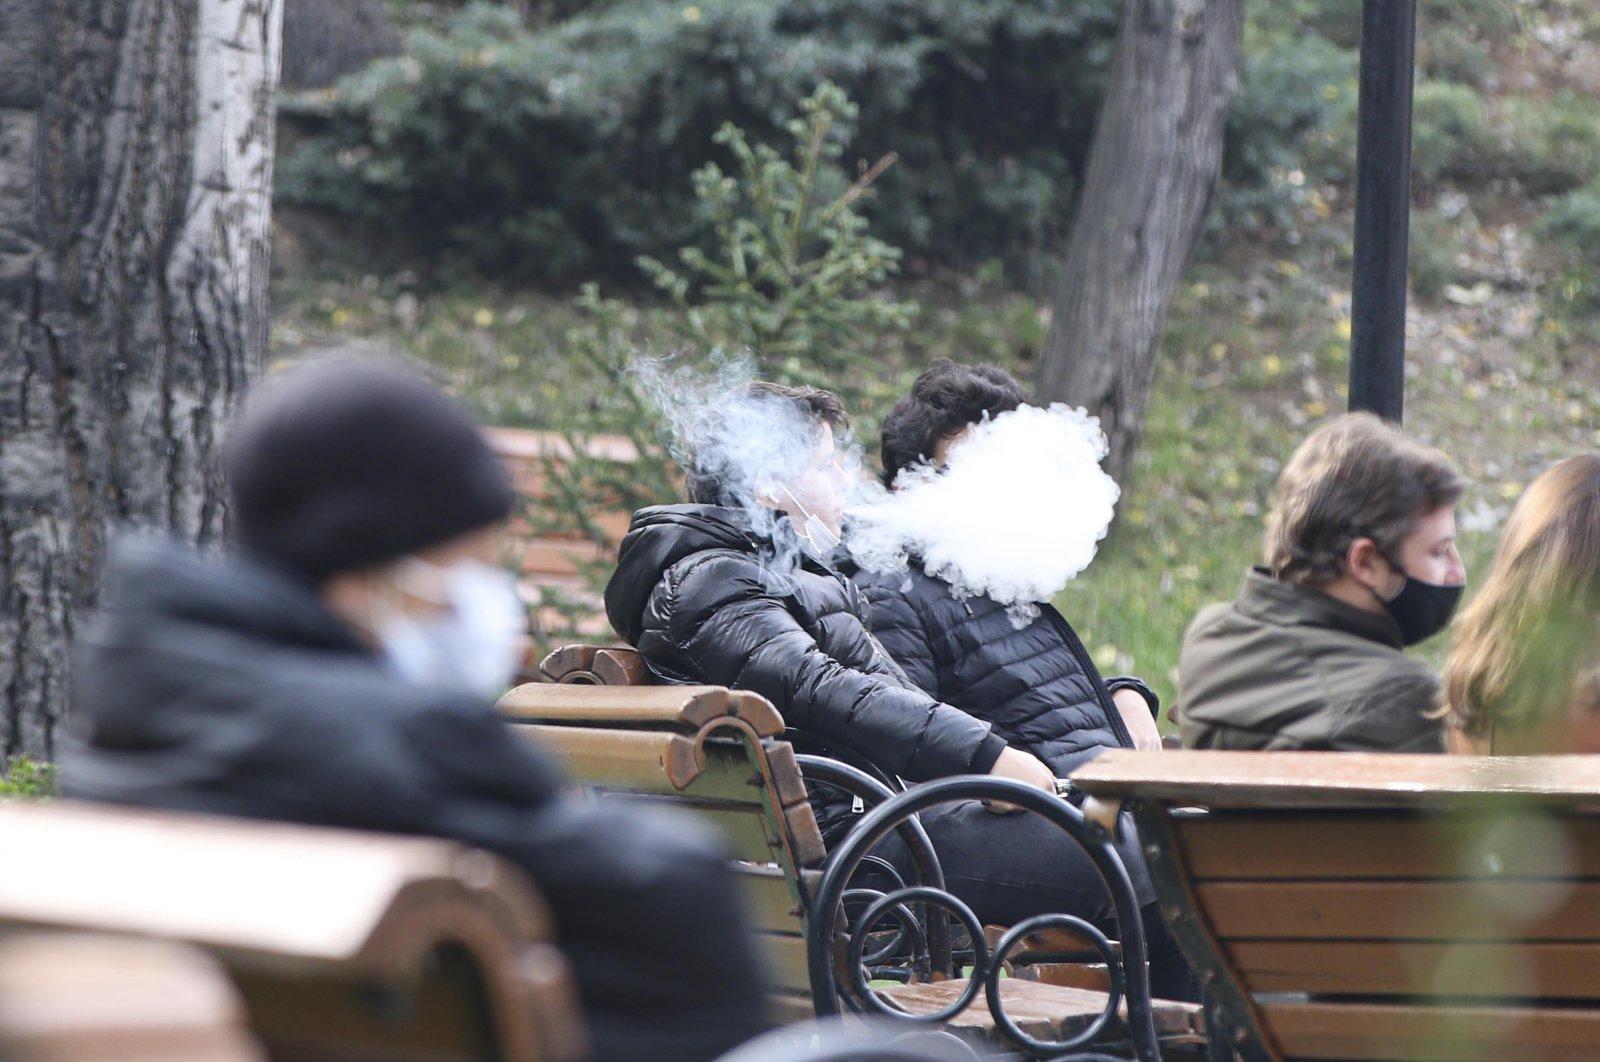 People smoke electronic cigarettes at a park in the capital Ankara, Turkey, Nov. 16, 2020. (DHA PHOTO)